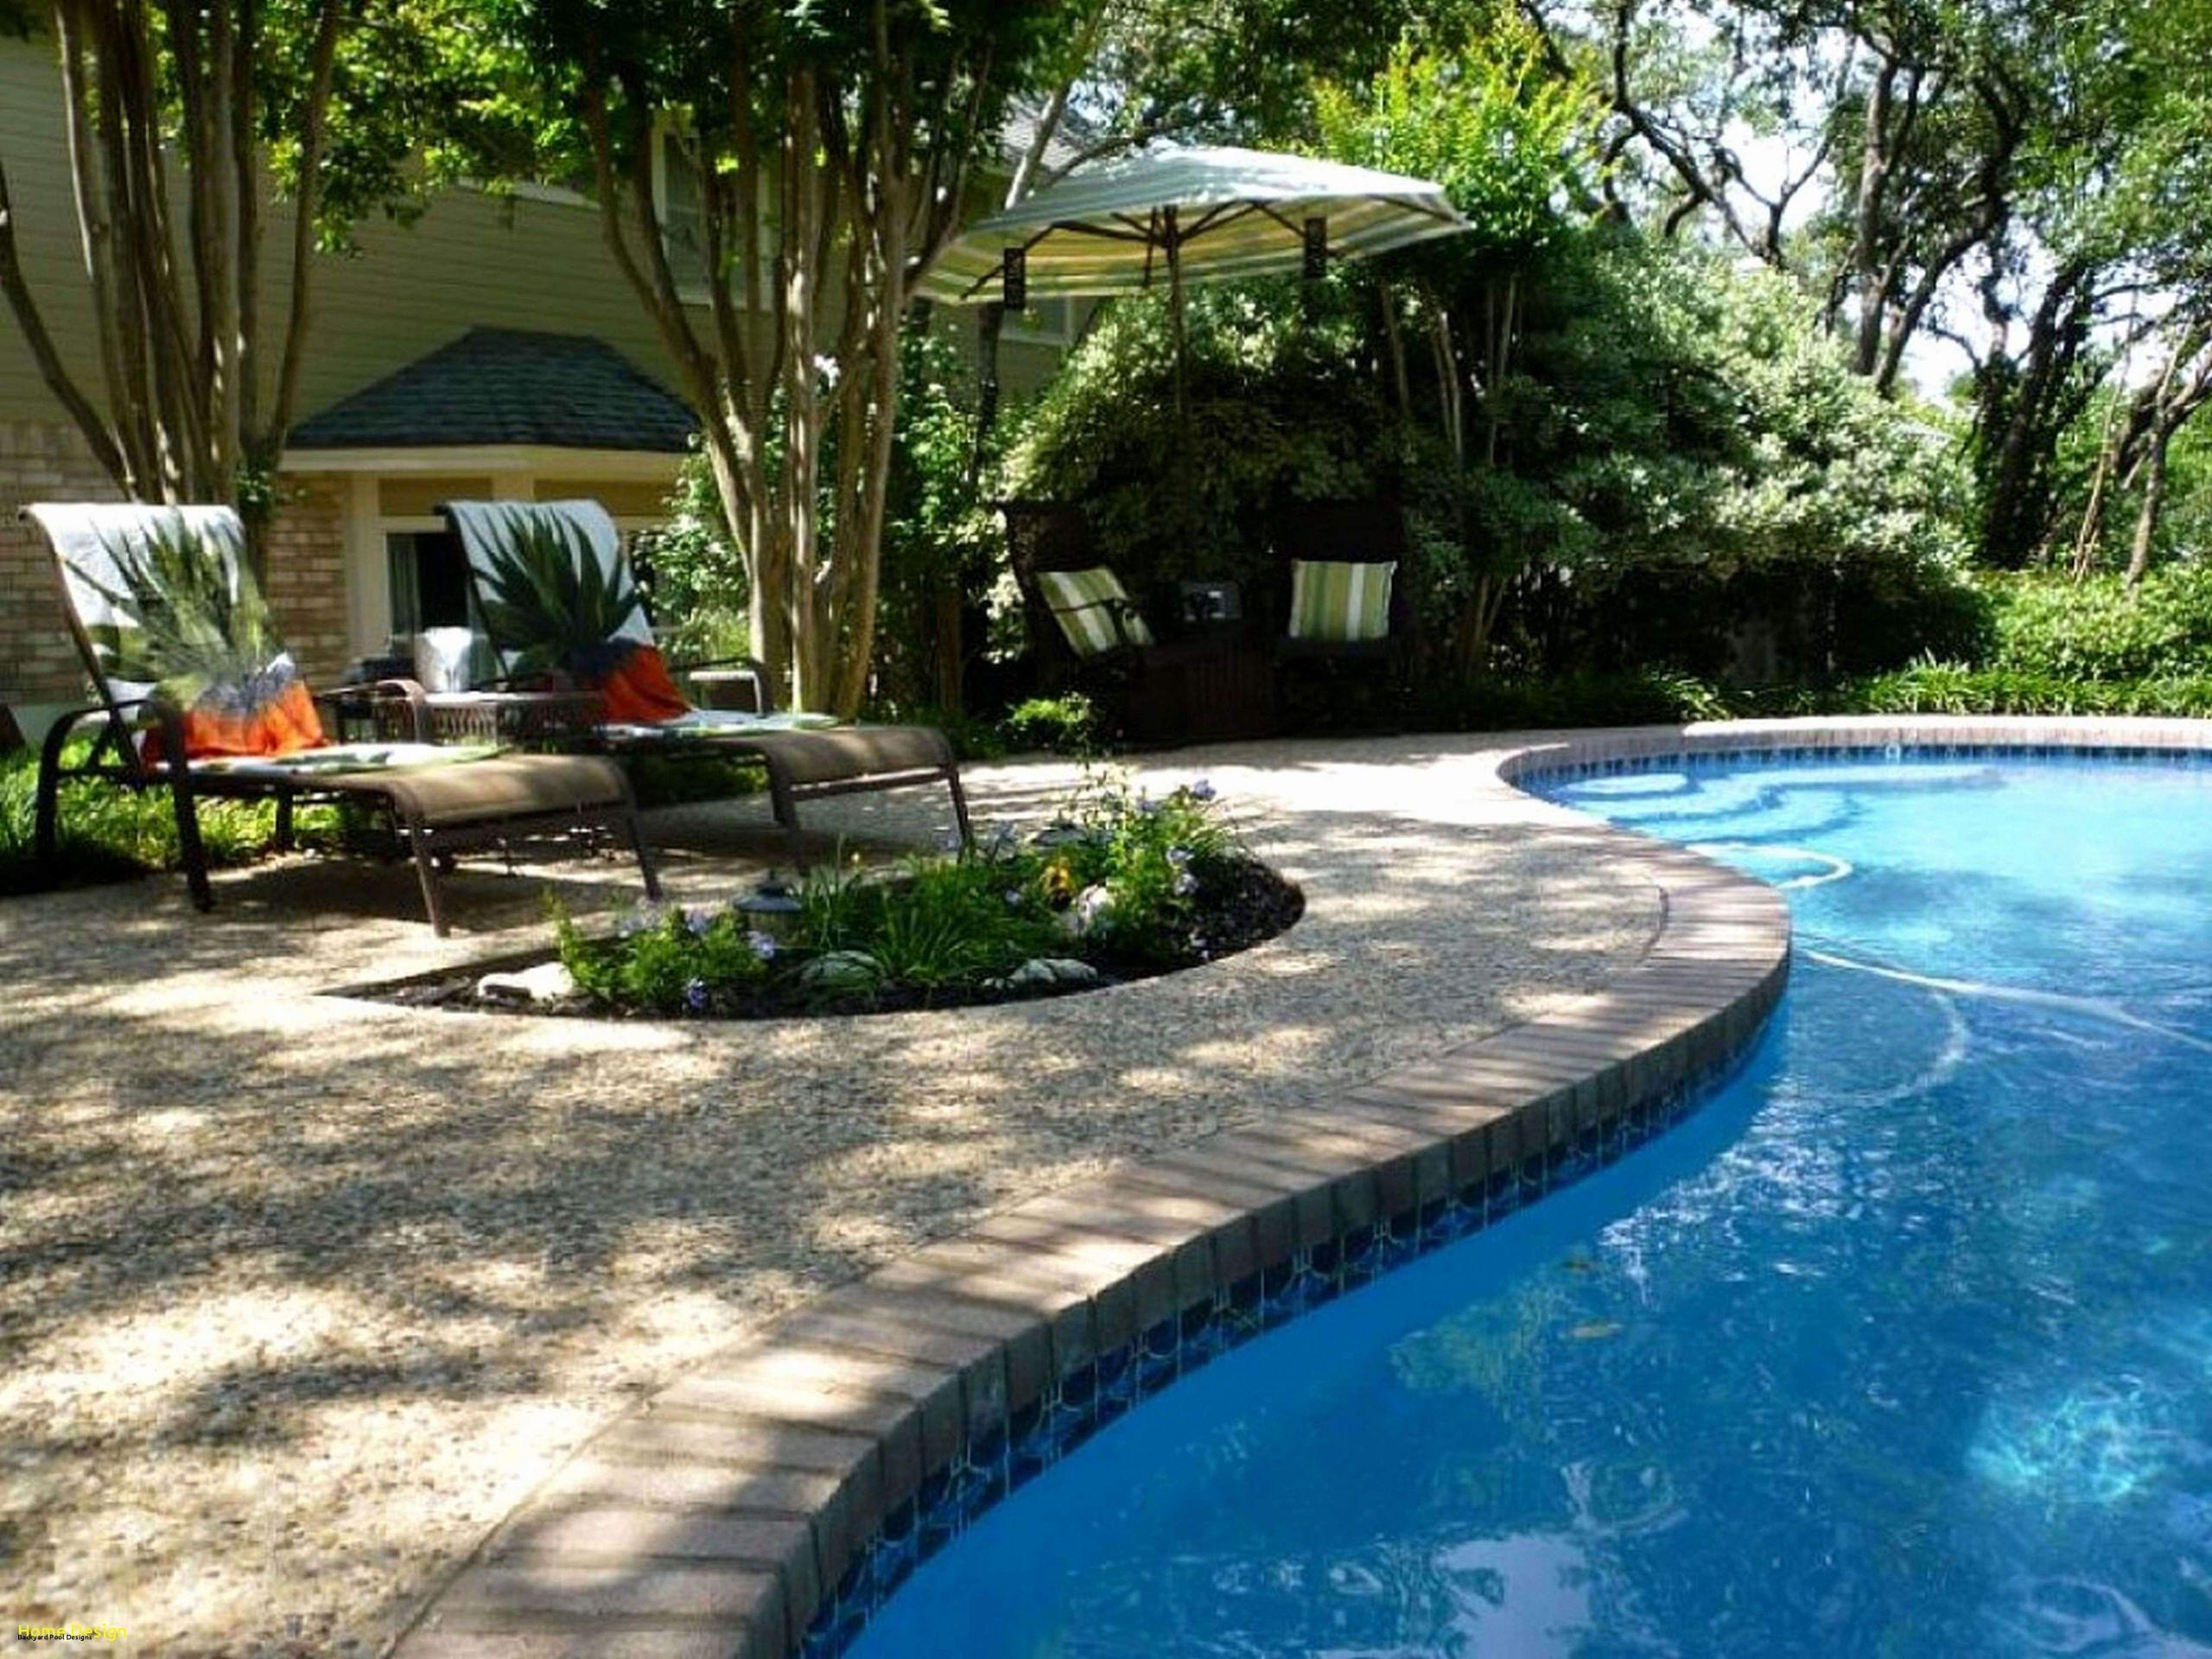 outdoor pool furniture luxury wood tables 0d archives best table pool bilder inspiration pool bilder inspiration